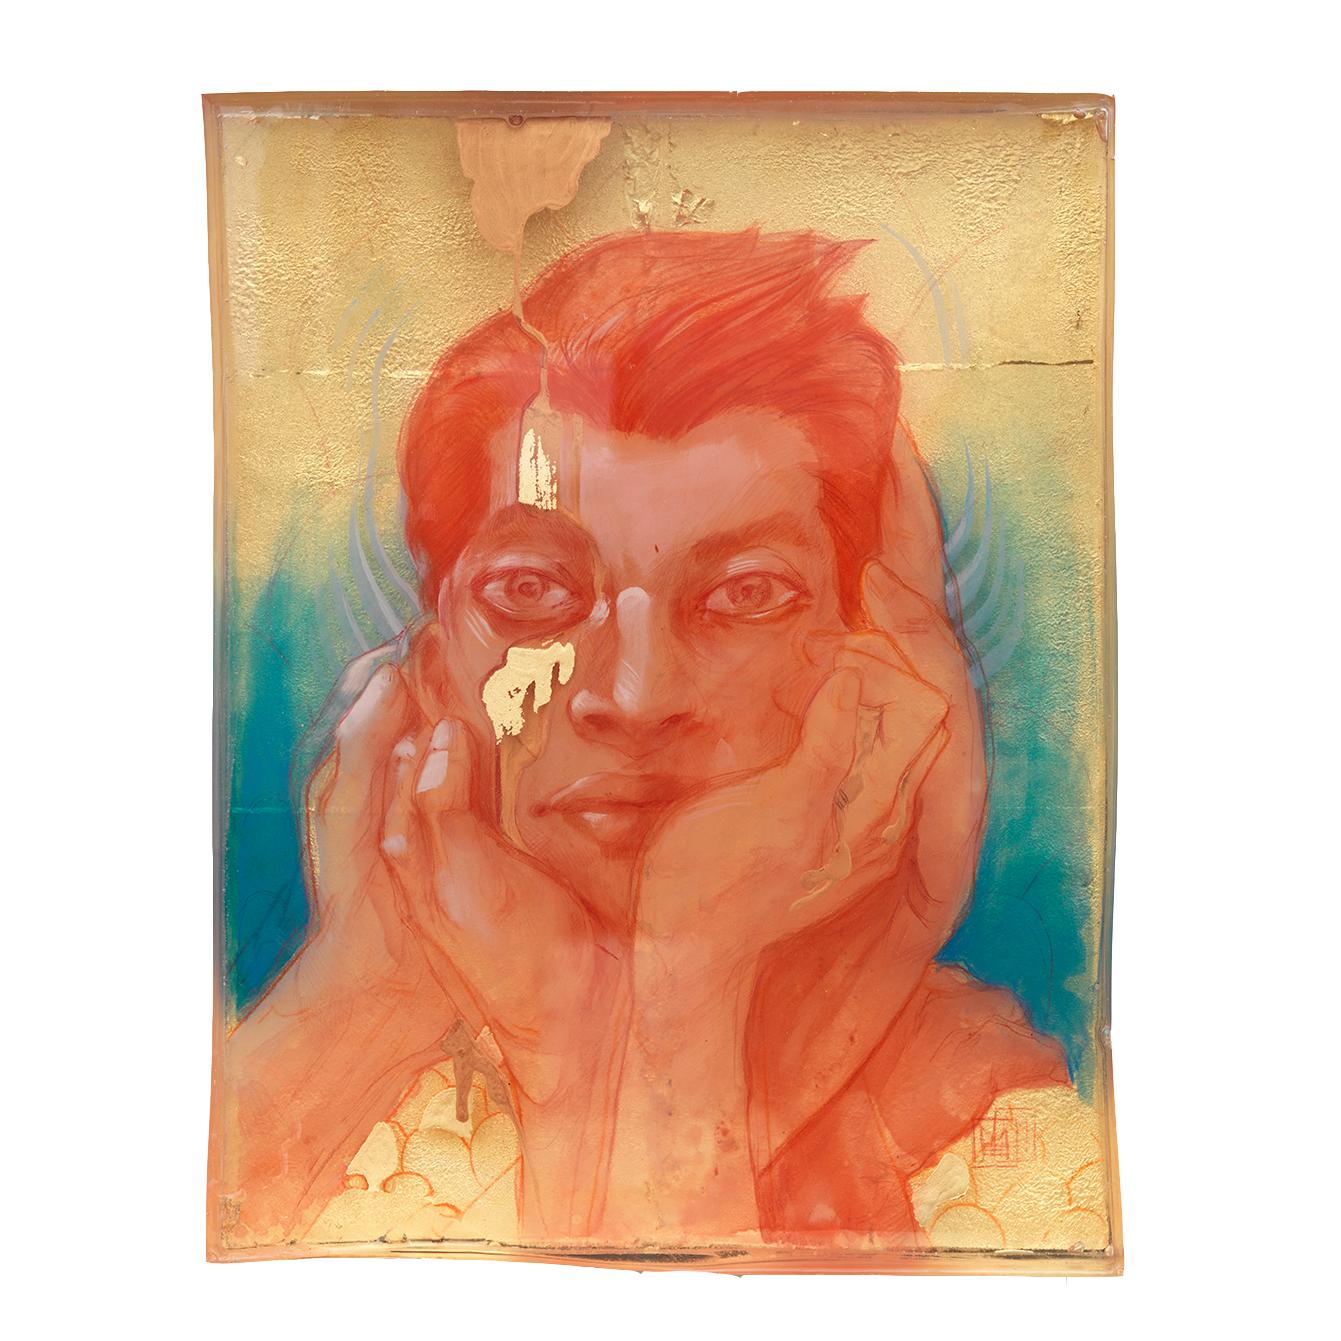 Dream-Reality-Marc-Scheff-afa-gallery-nyc-soho-new-york.jpg